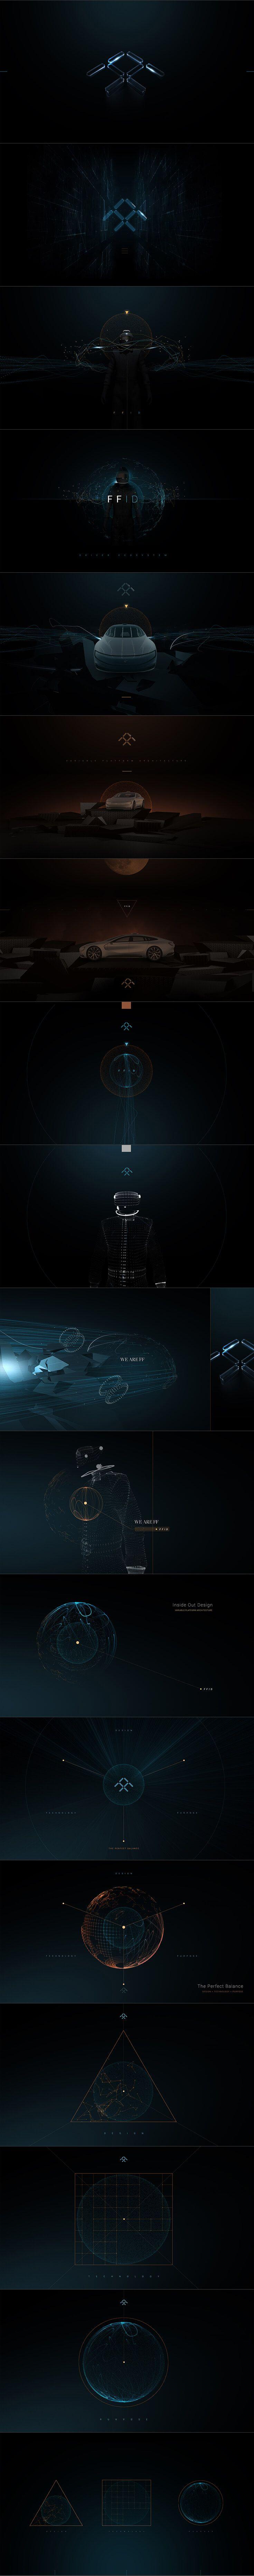 Faraday Future - Interactive design concepts by Eric Jordan [Set 1] #design #webdesign #website